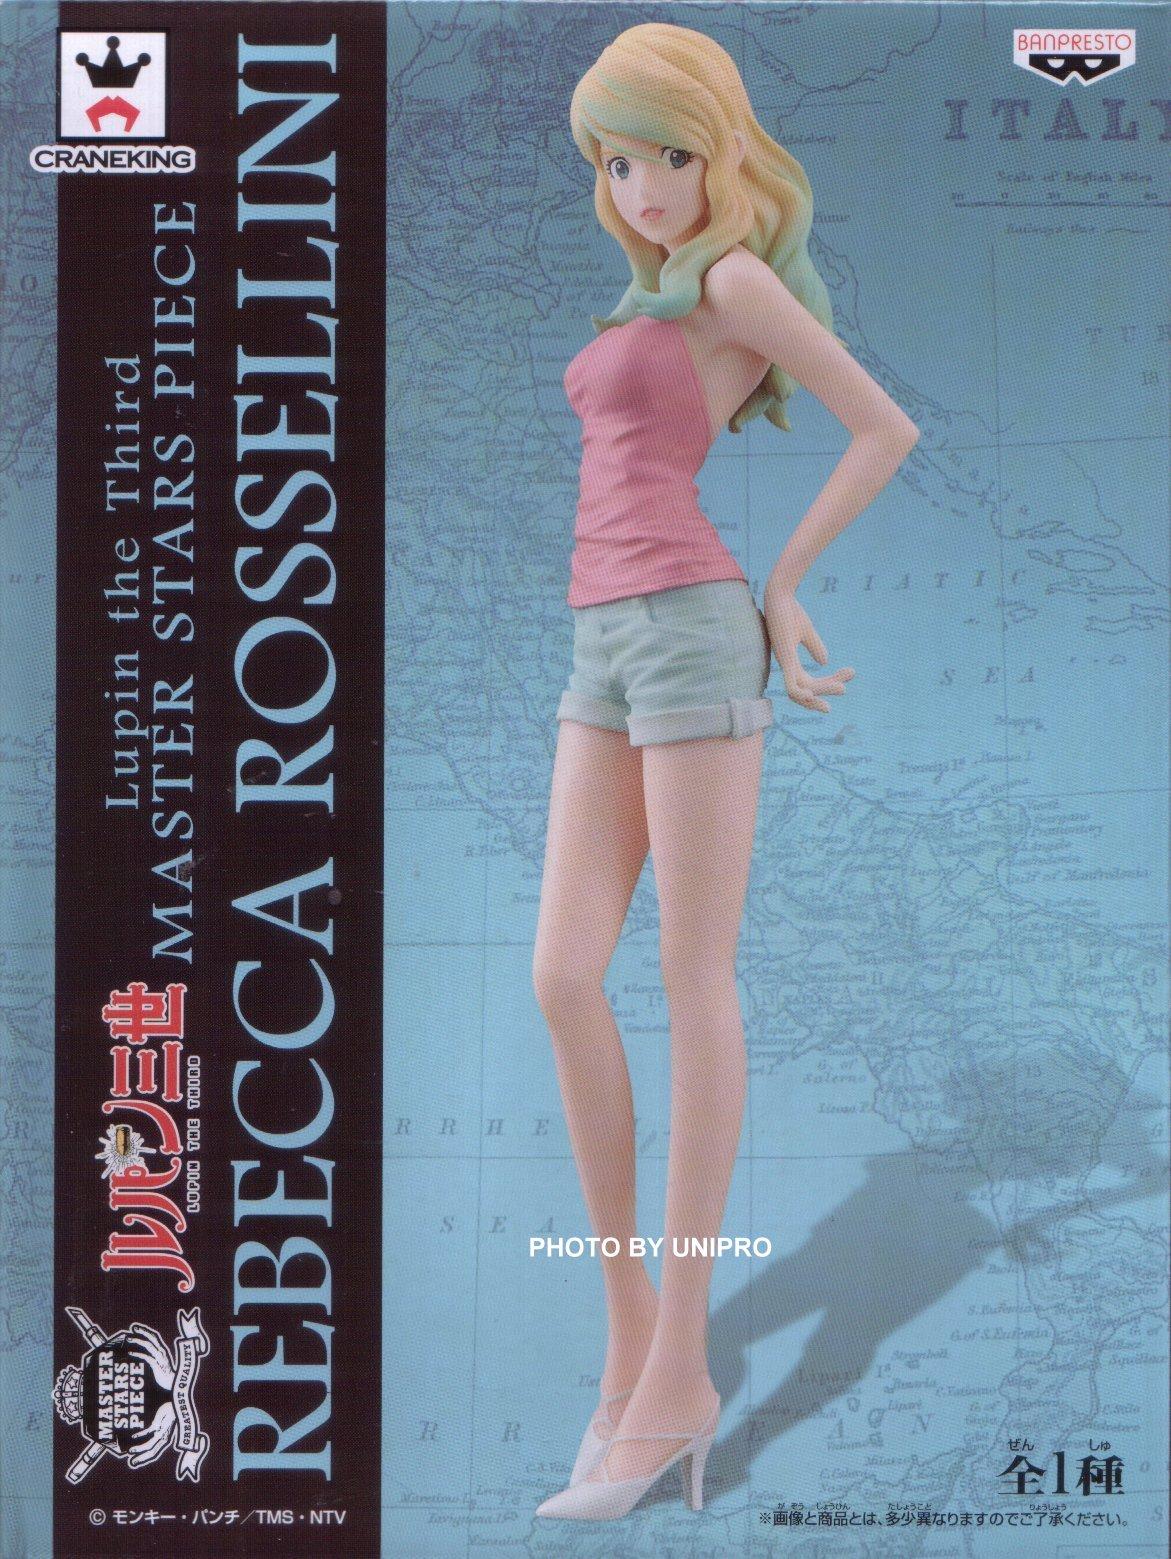 台灣代理版 MSP 單售 蕾貝卡 Rebecca Rossellini 魯邦三世 公仔 MASTER STARS PIECE GOEMON ISHIKAWA